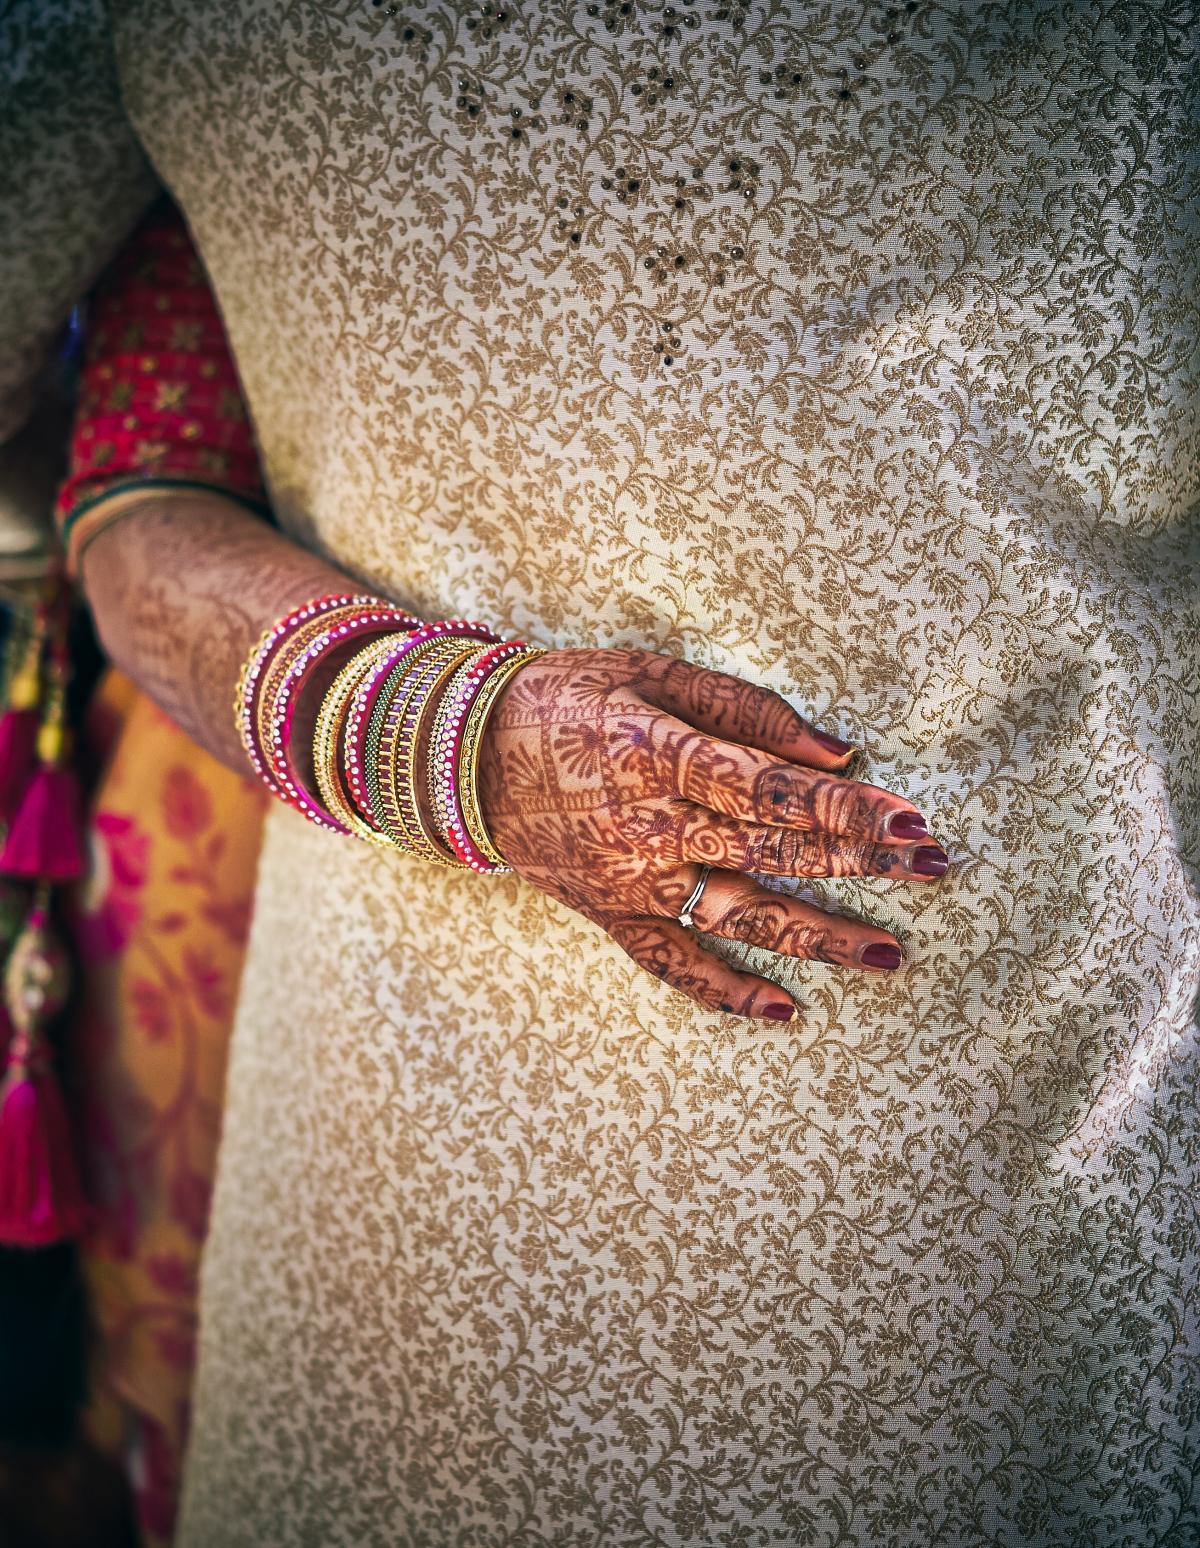 Finger Skin Hands